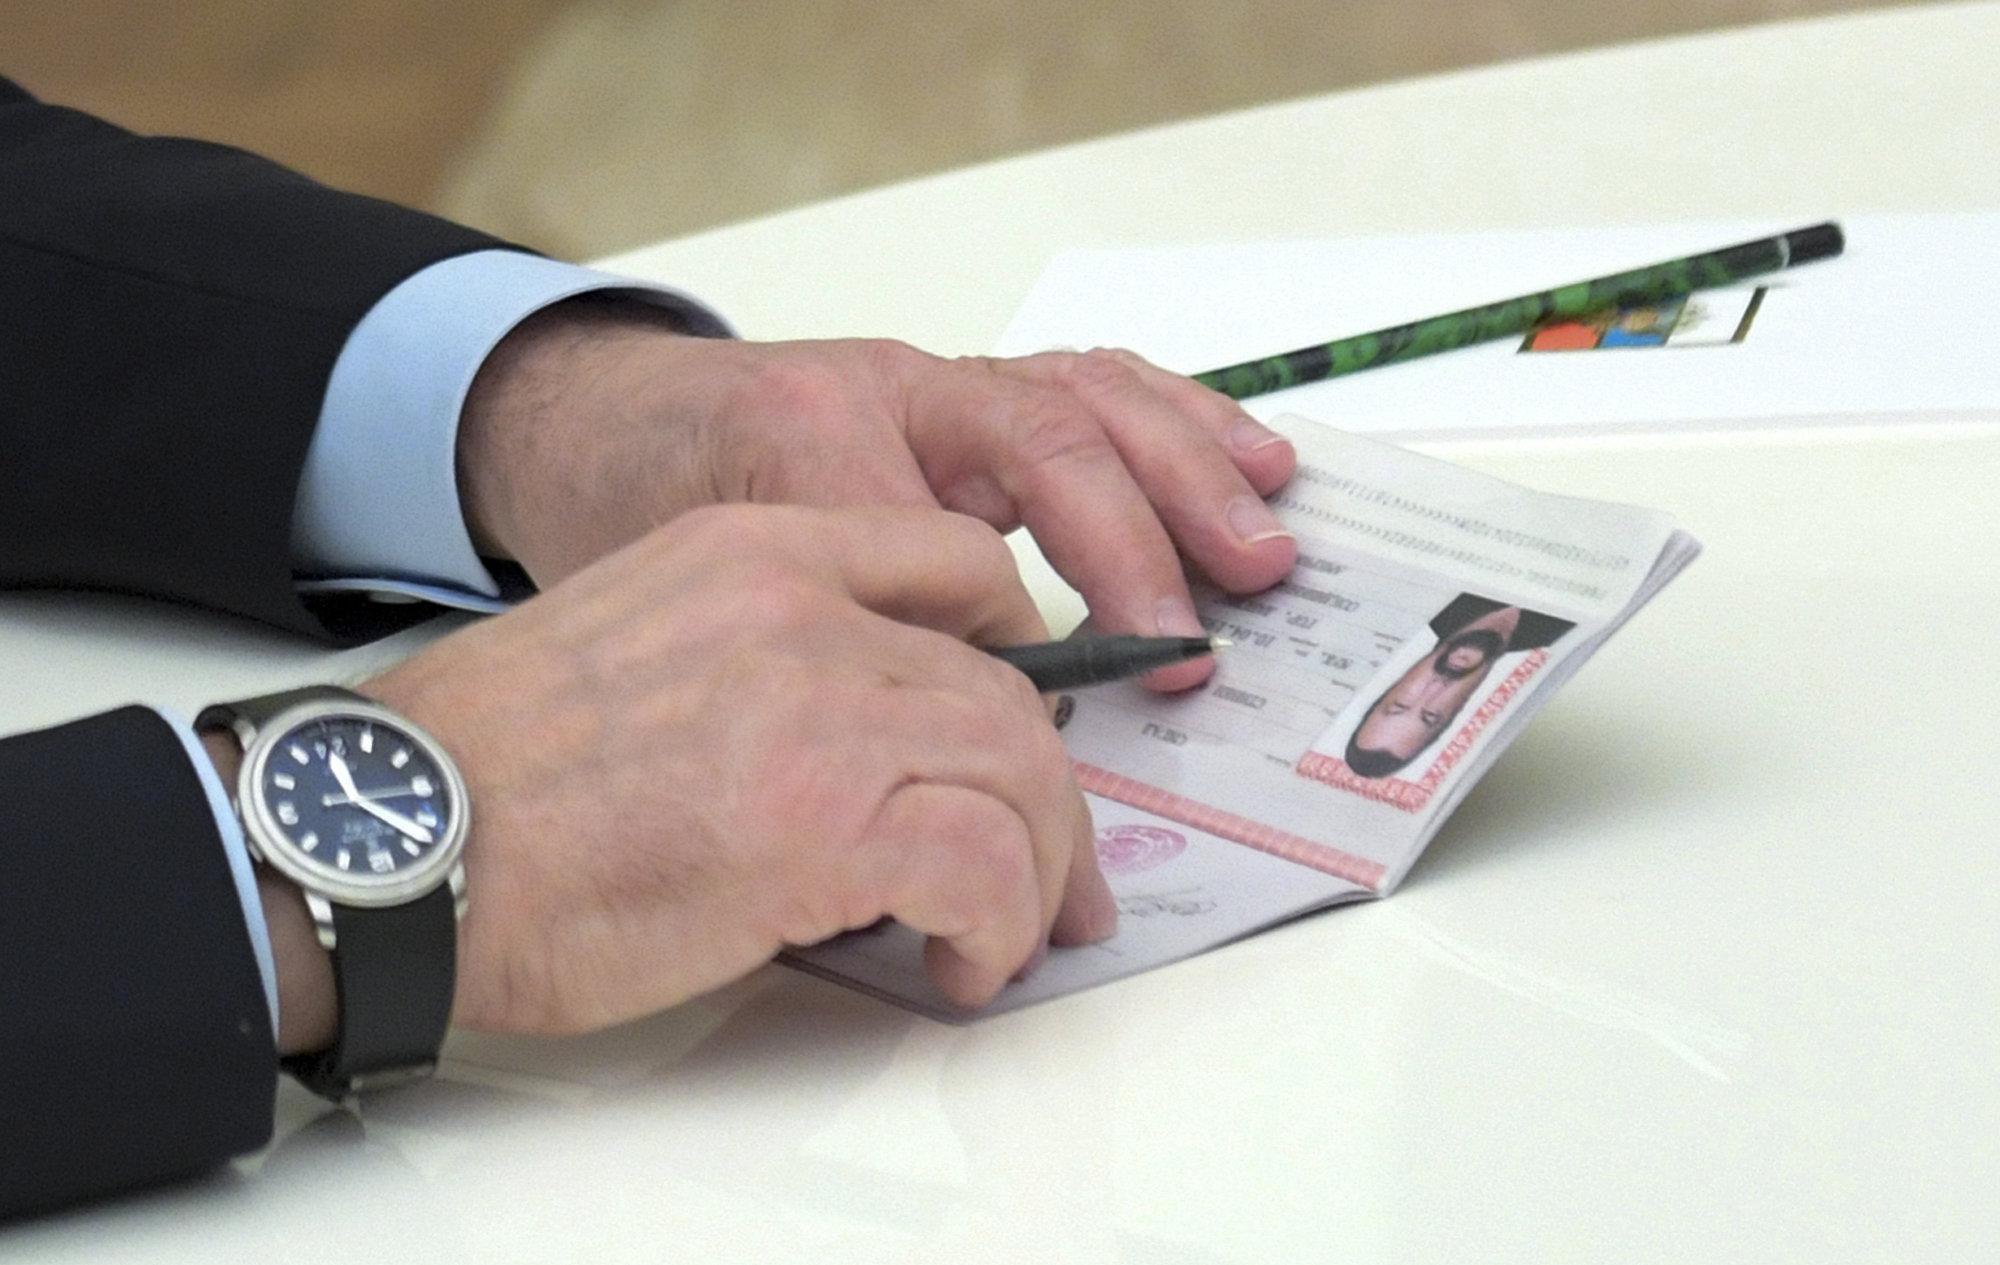 EL pasaporte ruso de Steven Seagal, actor estadounidense